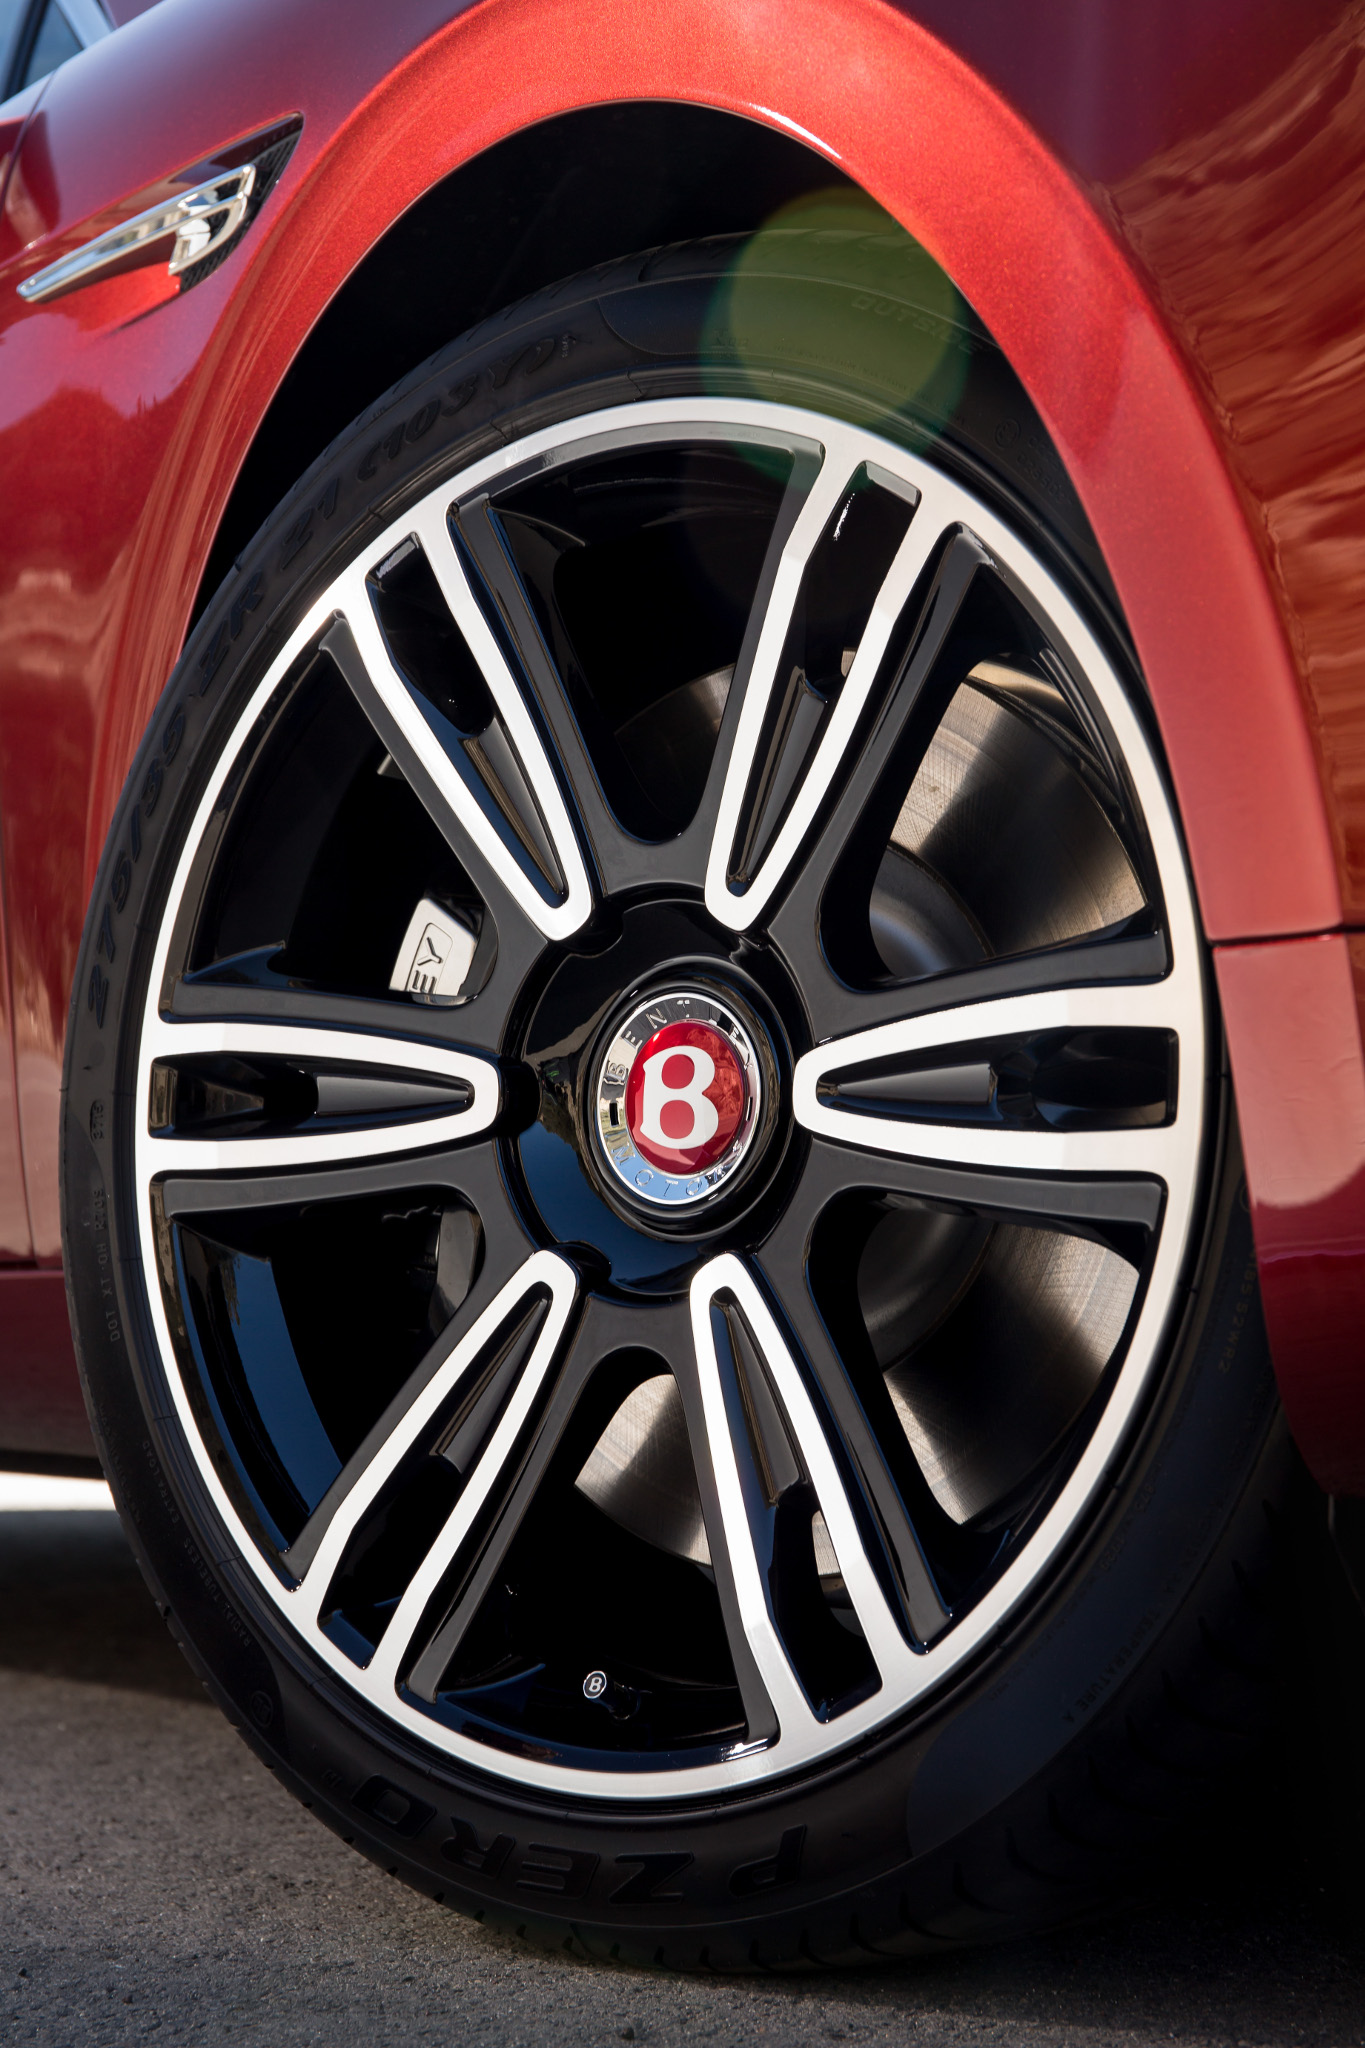 BentleyFlyingSpurV8S 05